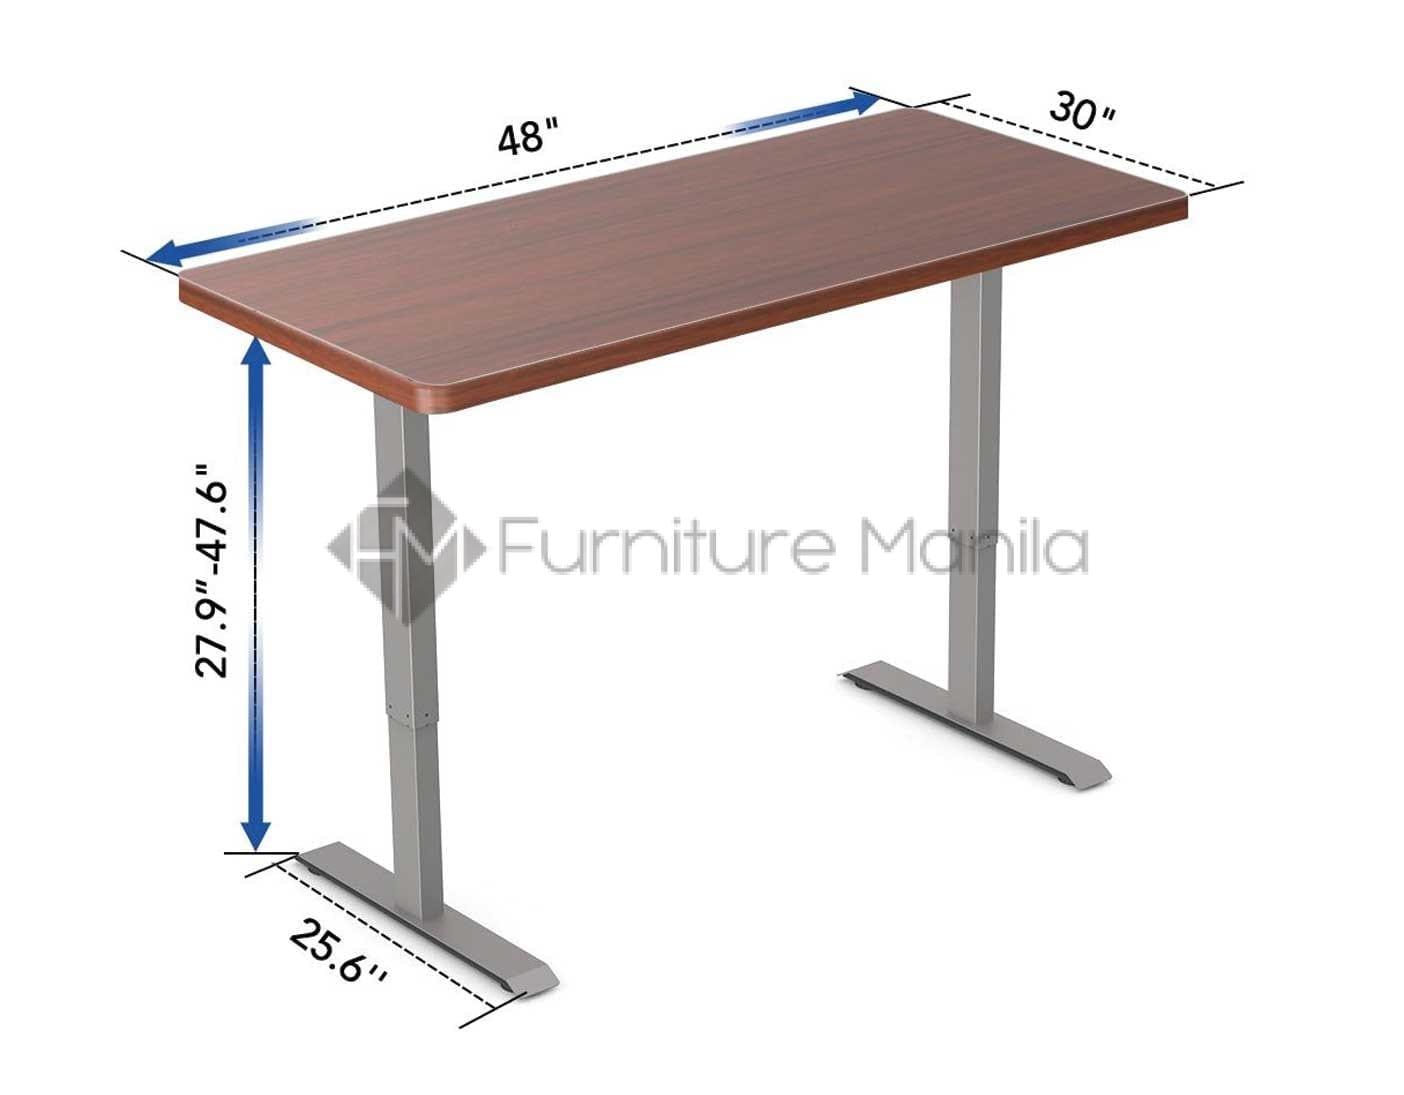 Picture of: Flexispot E2e Electric Height Adjustable Desk Frame Tabletop Furniture Manila